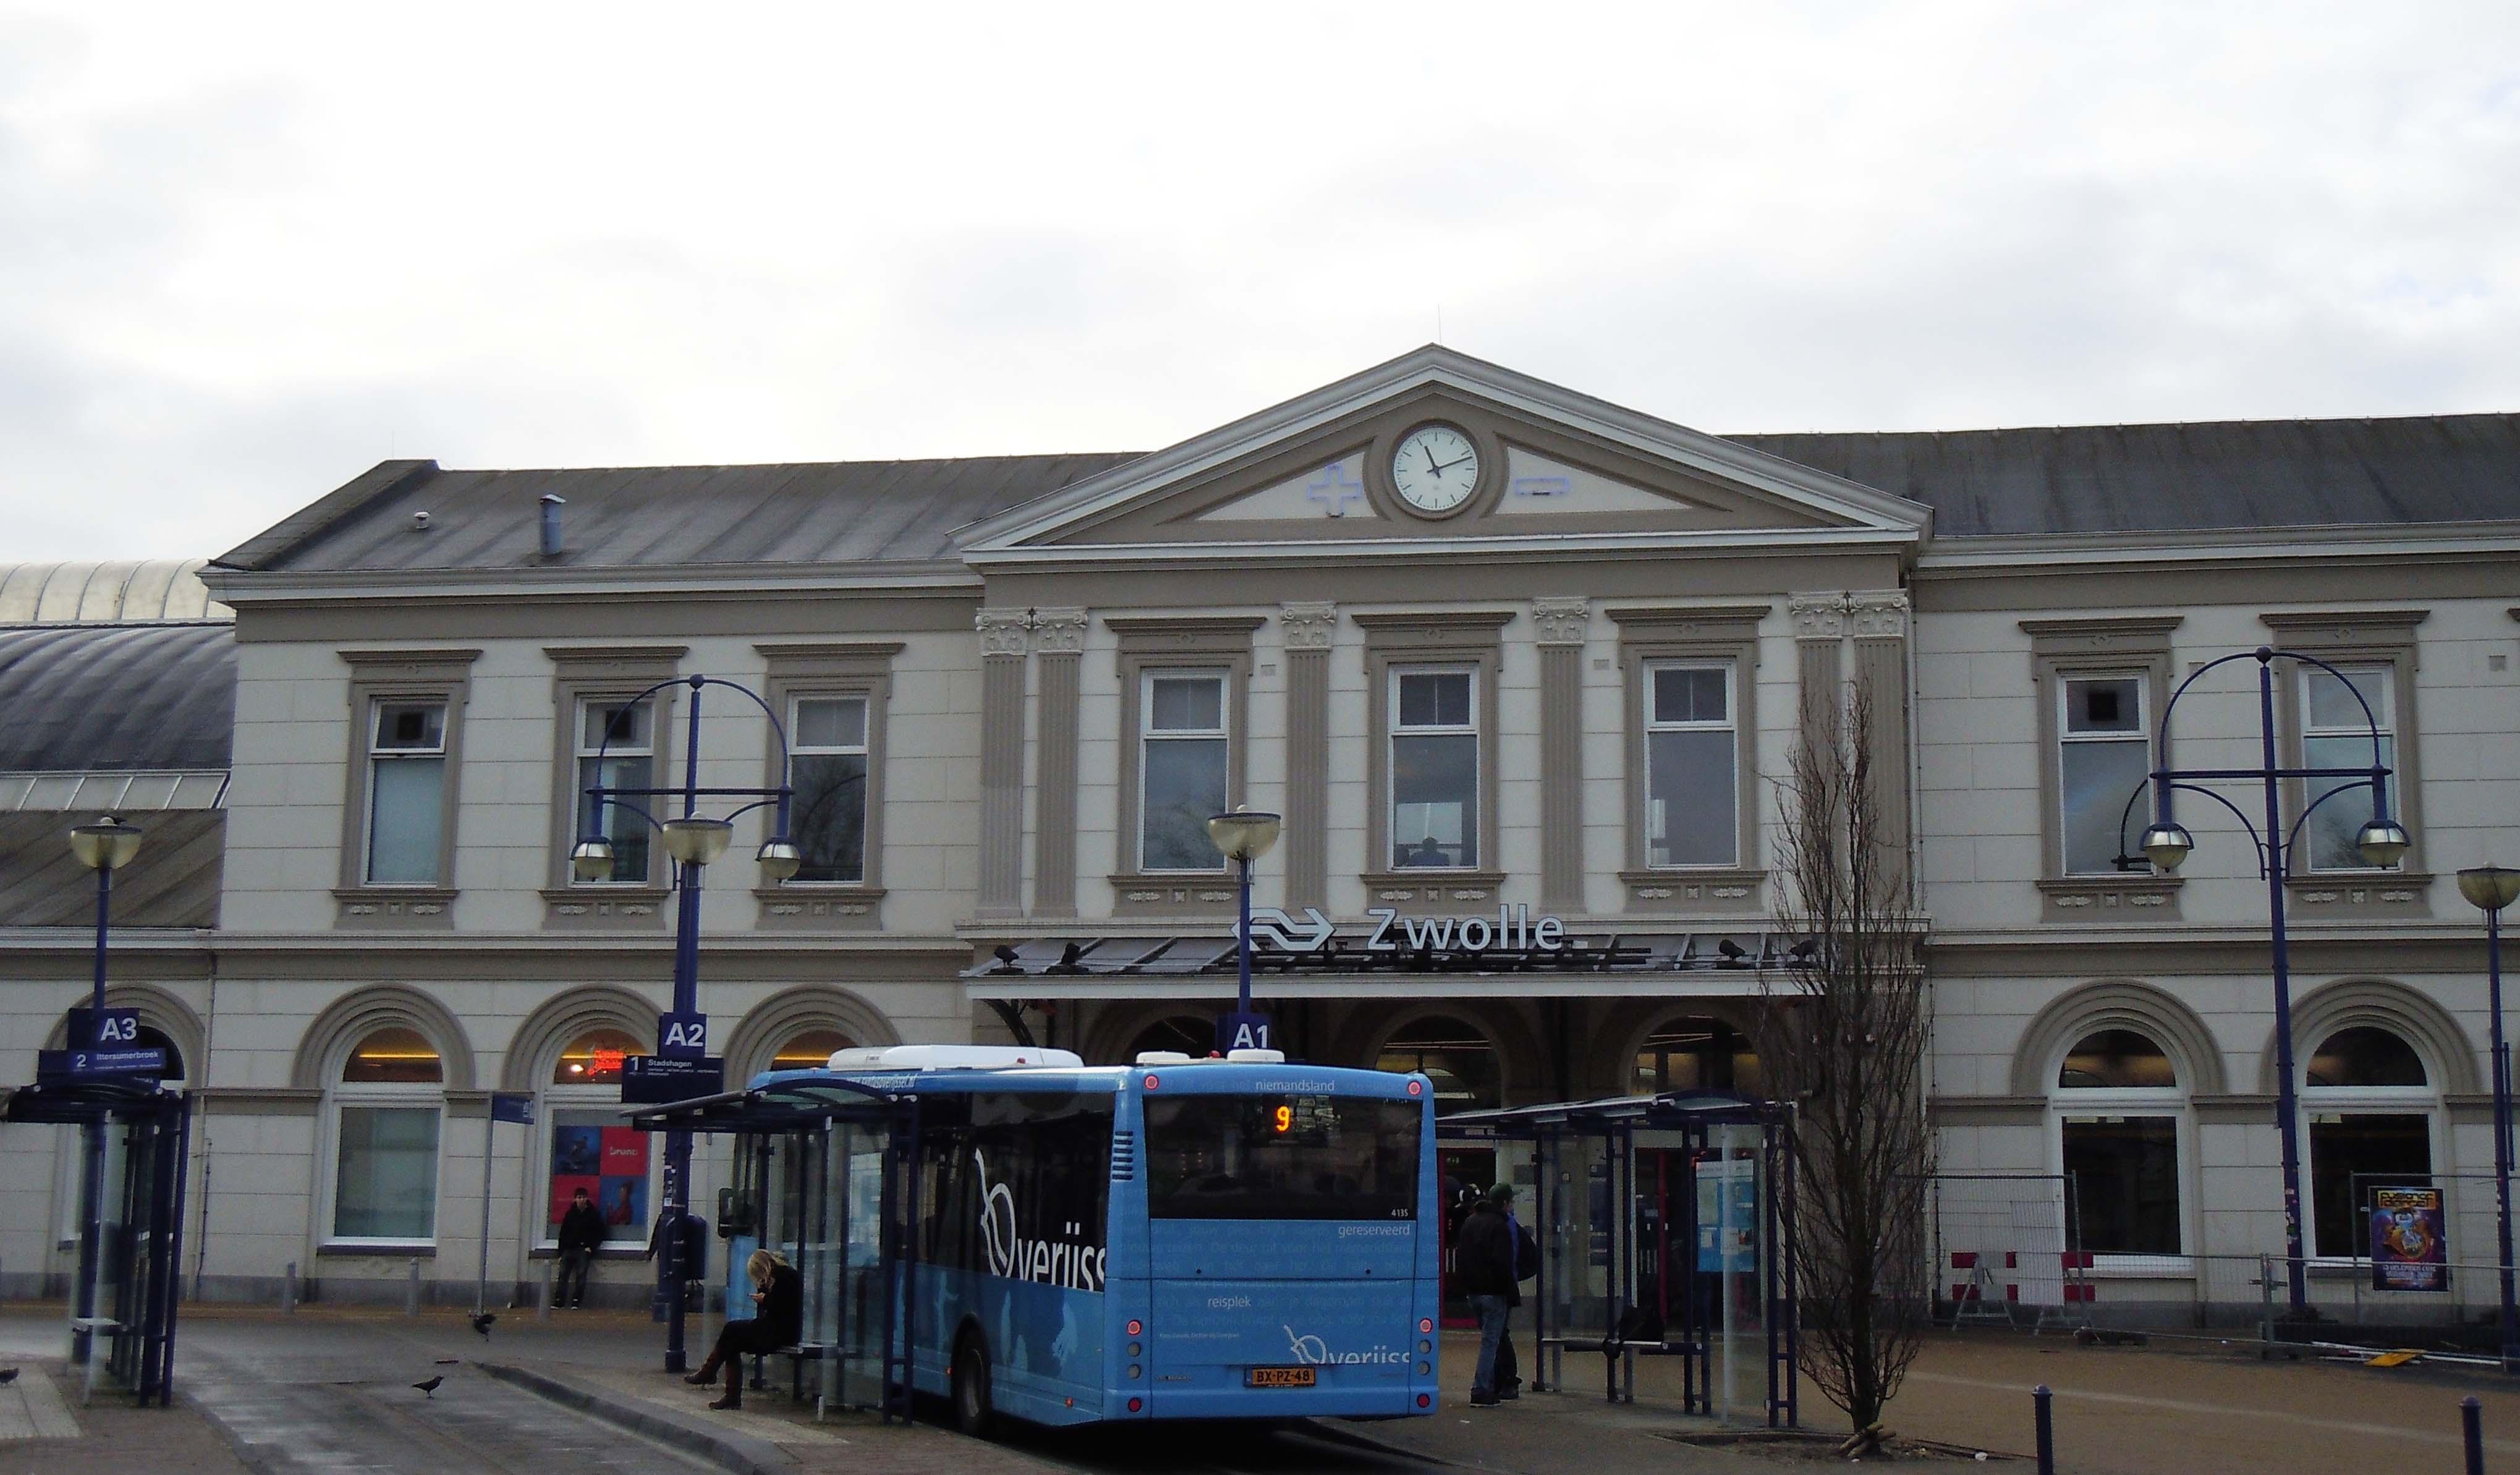 StationZwolle